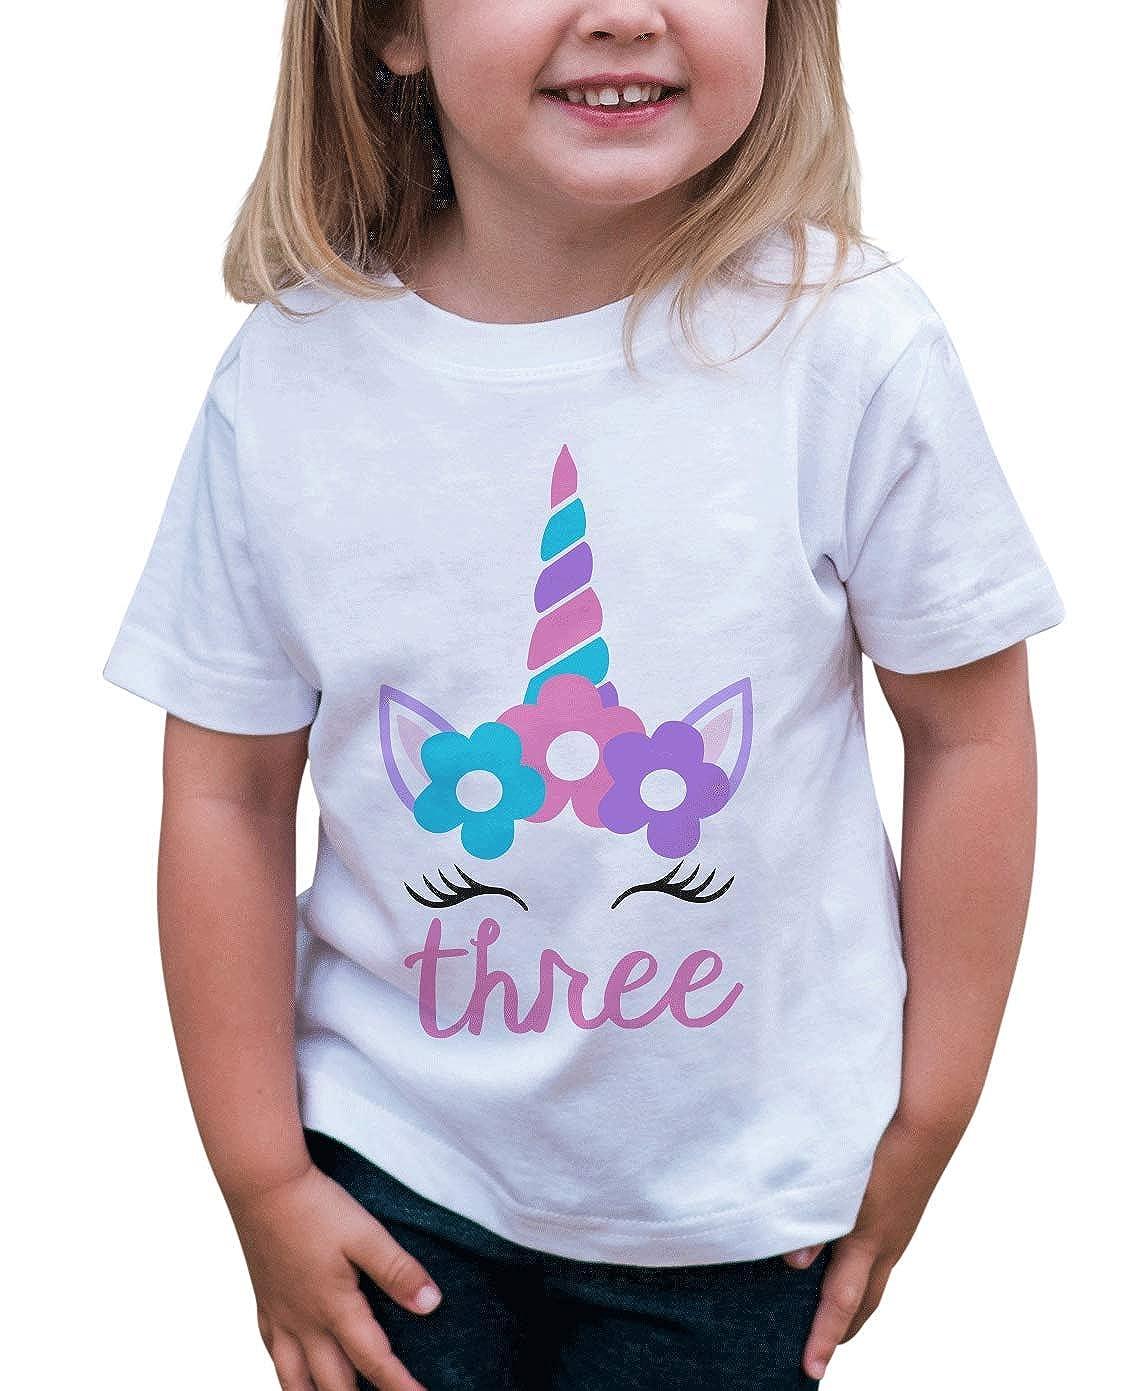 7 ate 9 Apparel Girls Three Birthday Unicorn T-Shirt